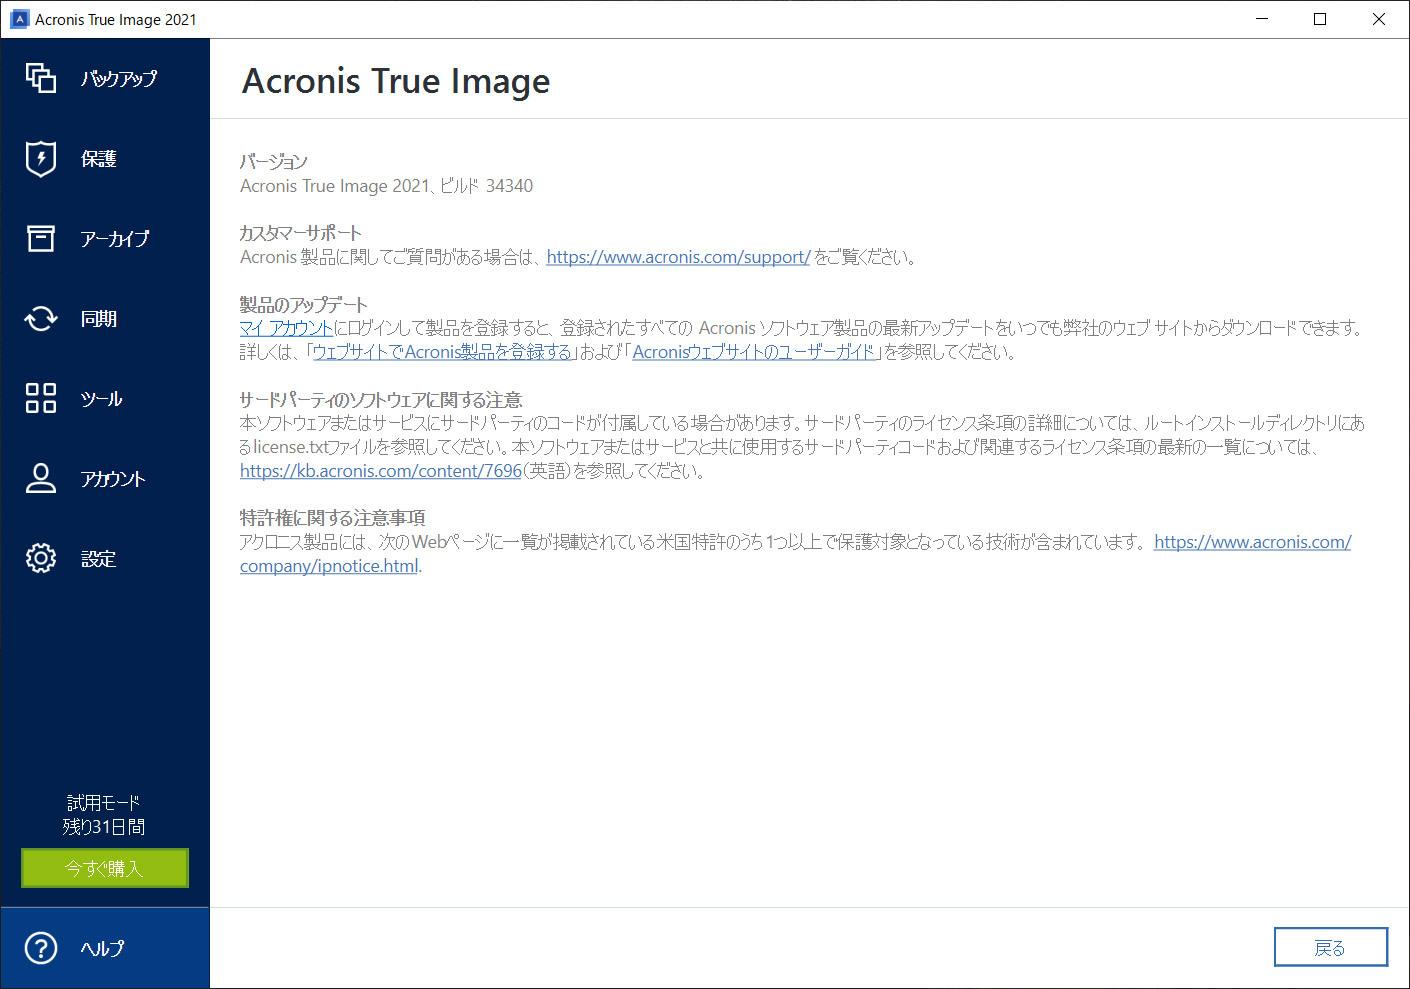 「Acronis True Image 2021」Build 34340